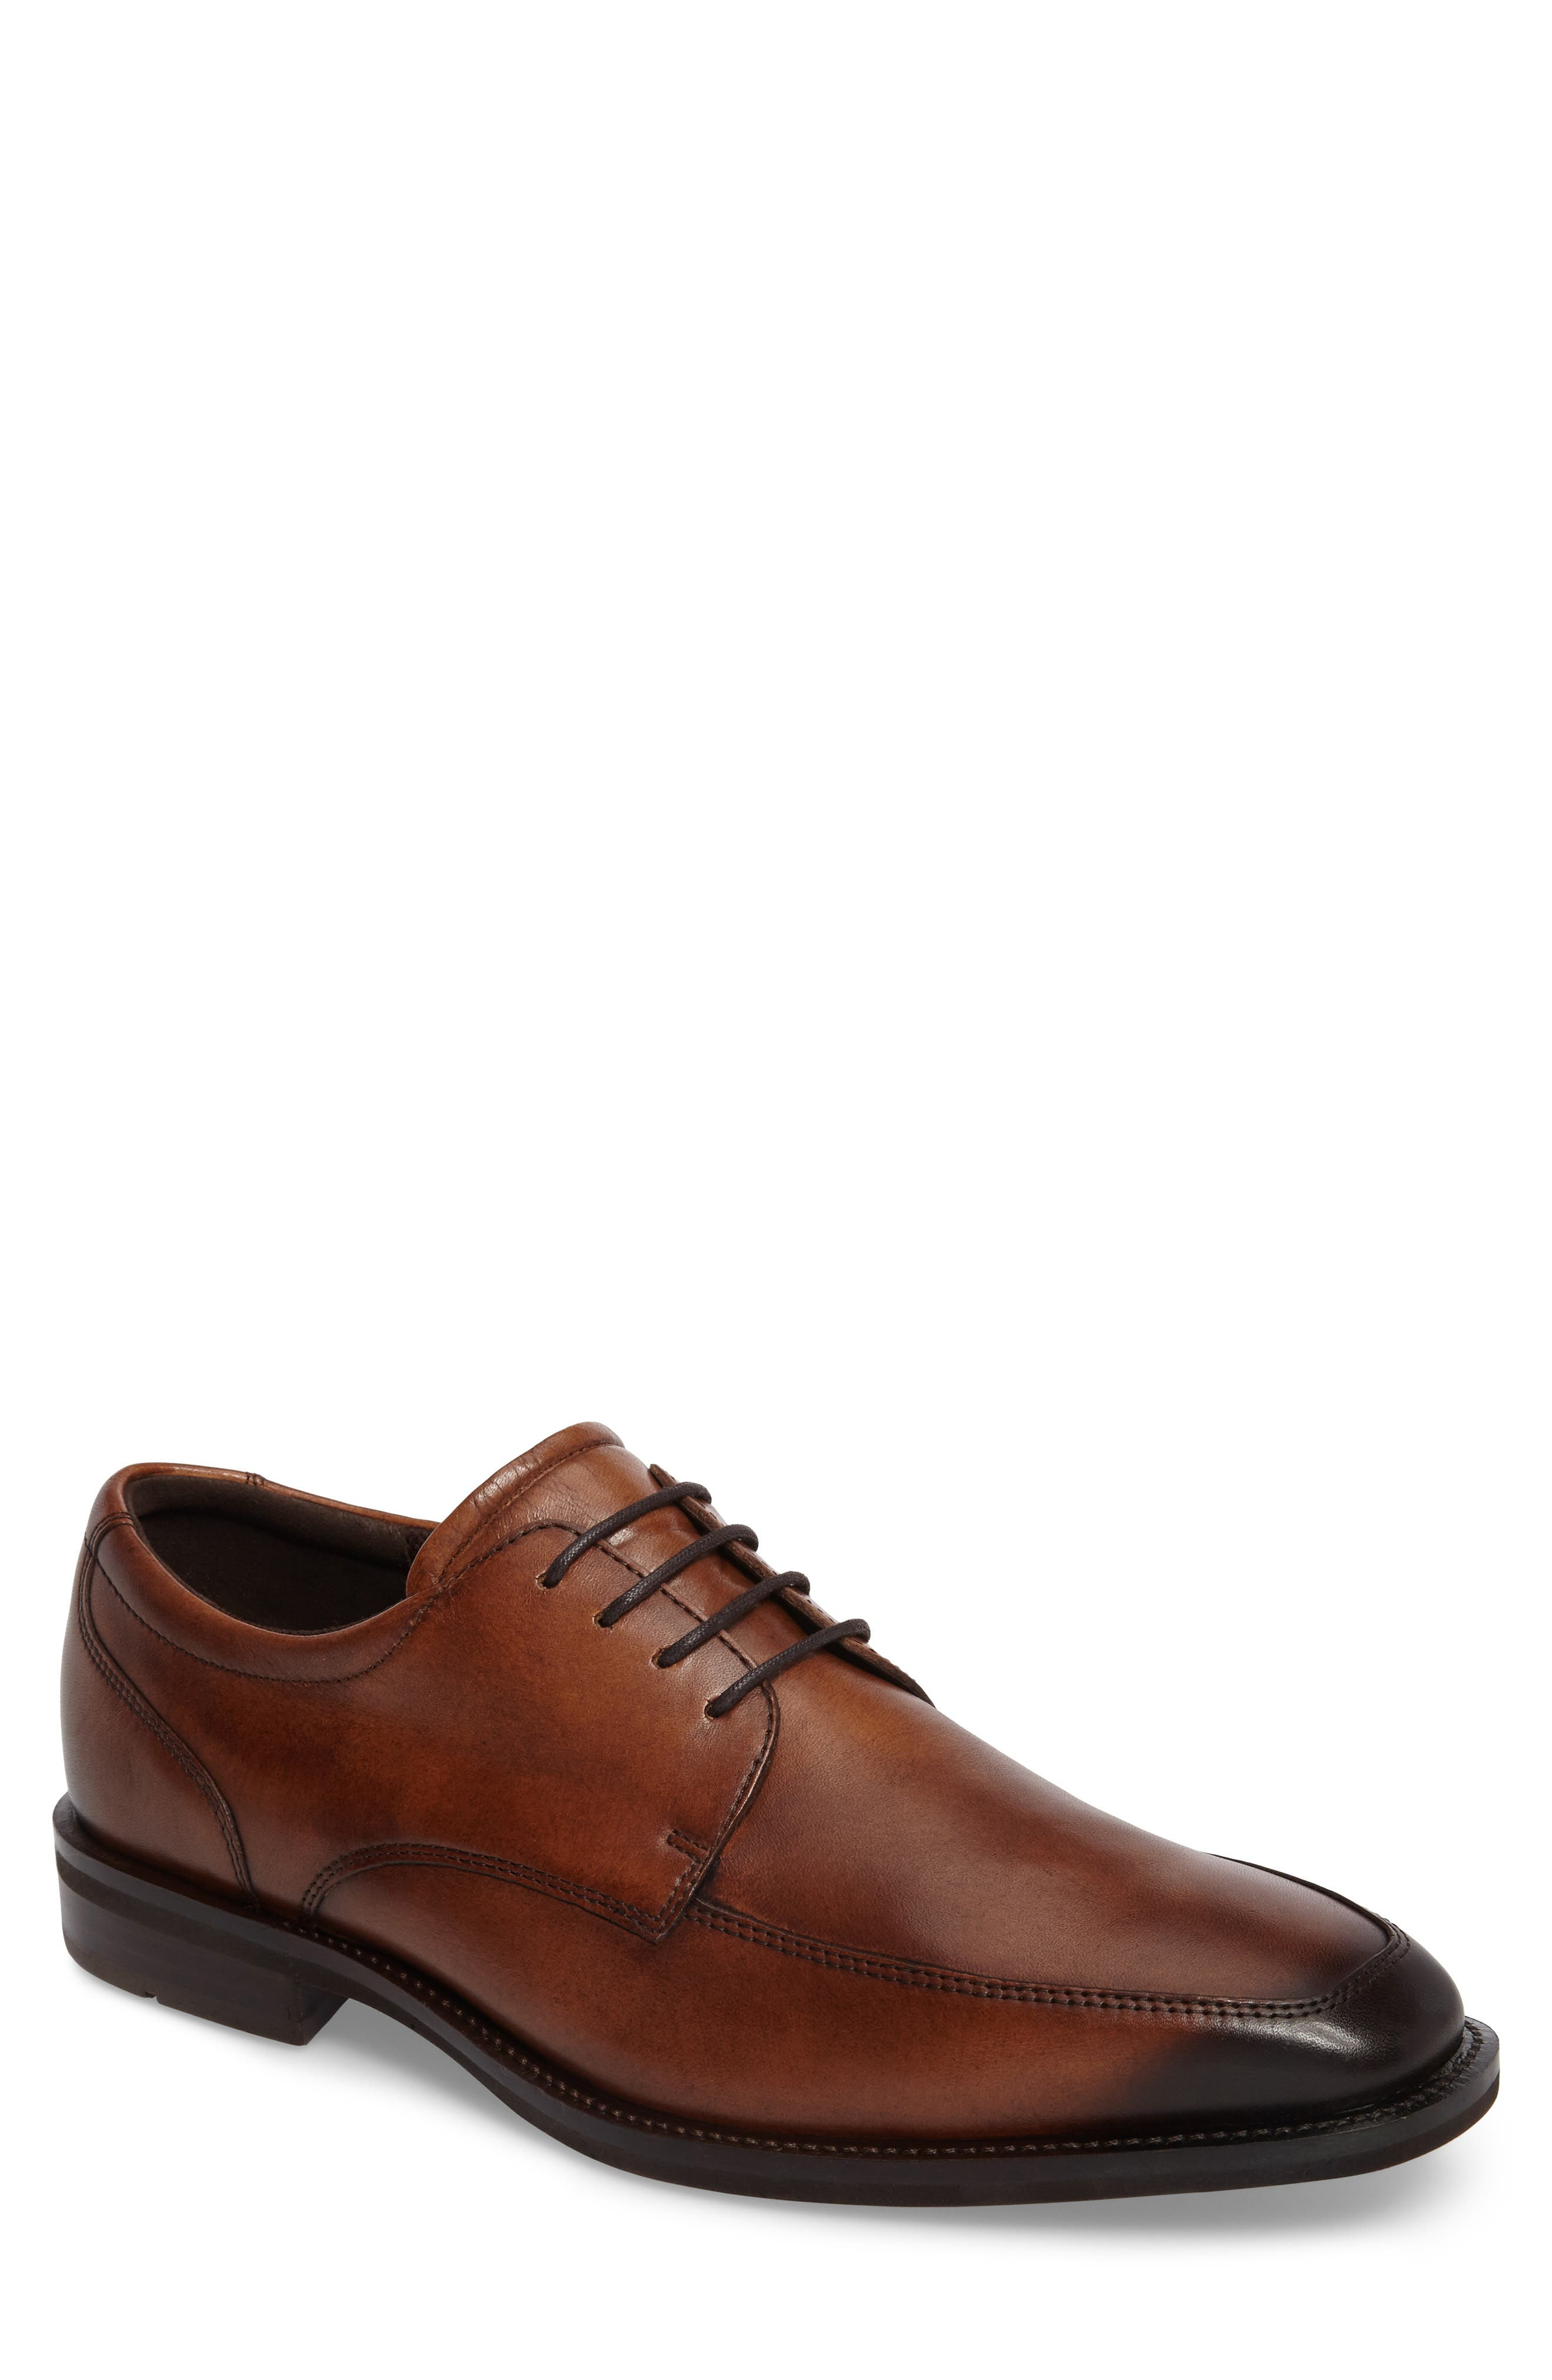 Faro Apron Toe Derby,                         Main,                         color, Amber Leather